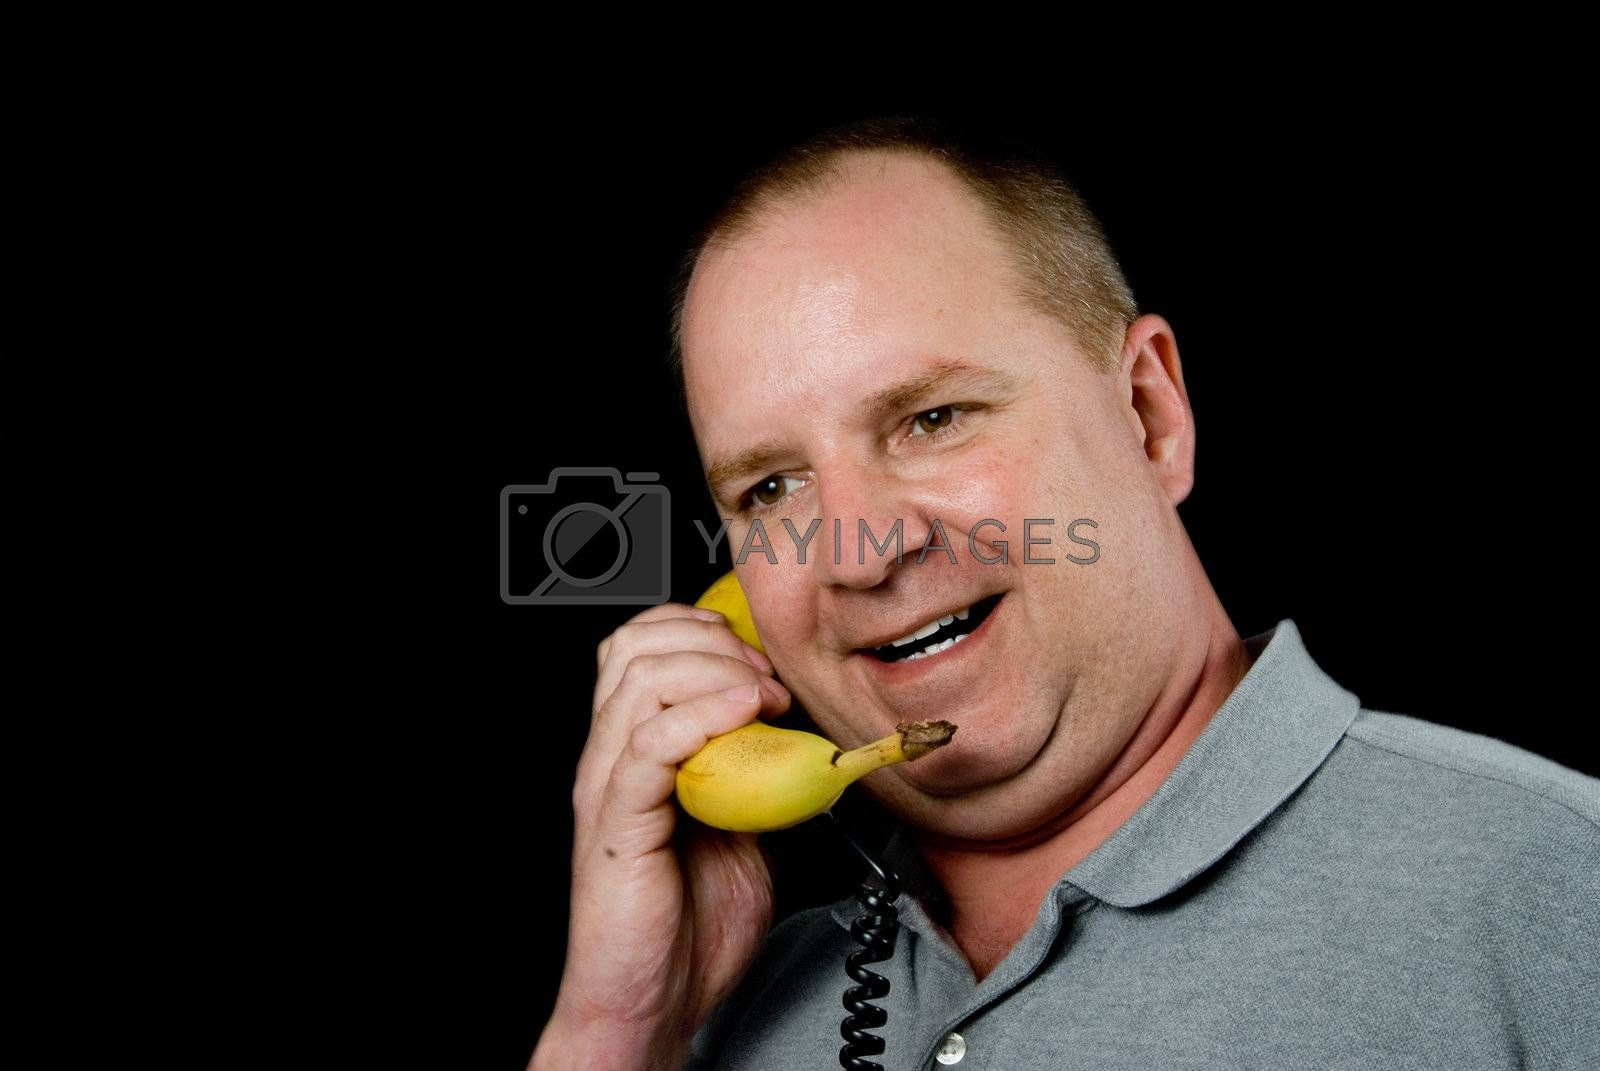 A man talking on a banana phone.